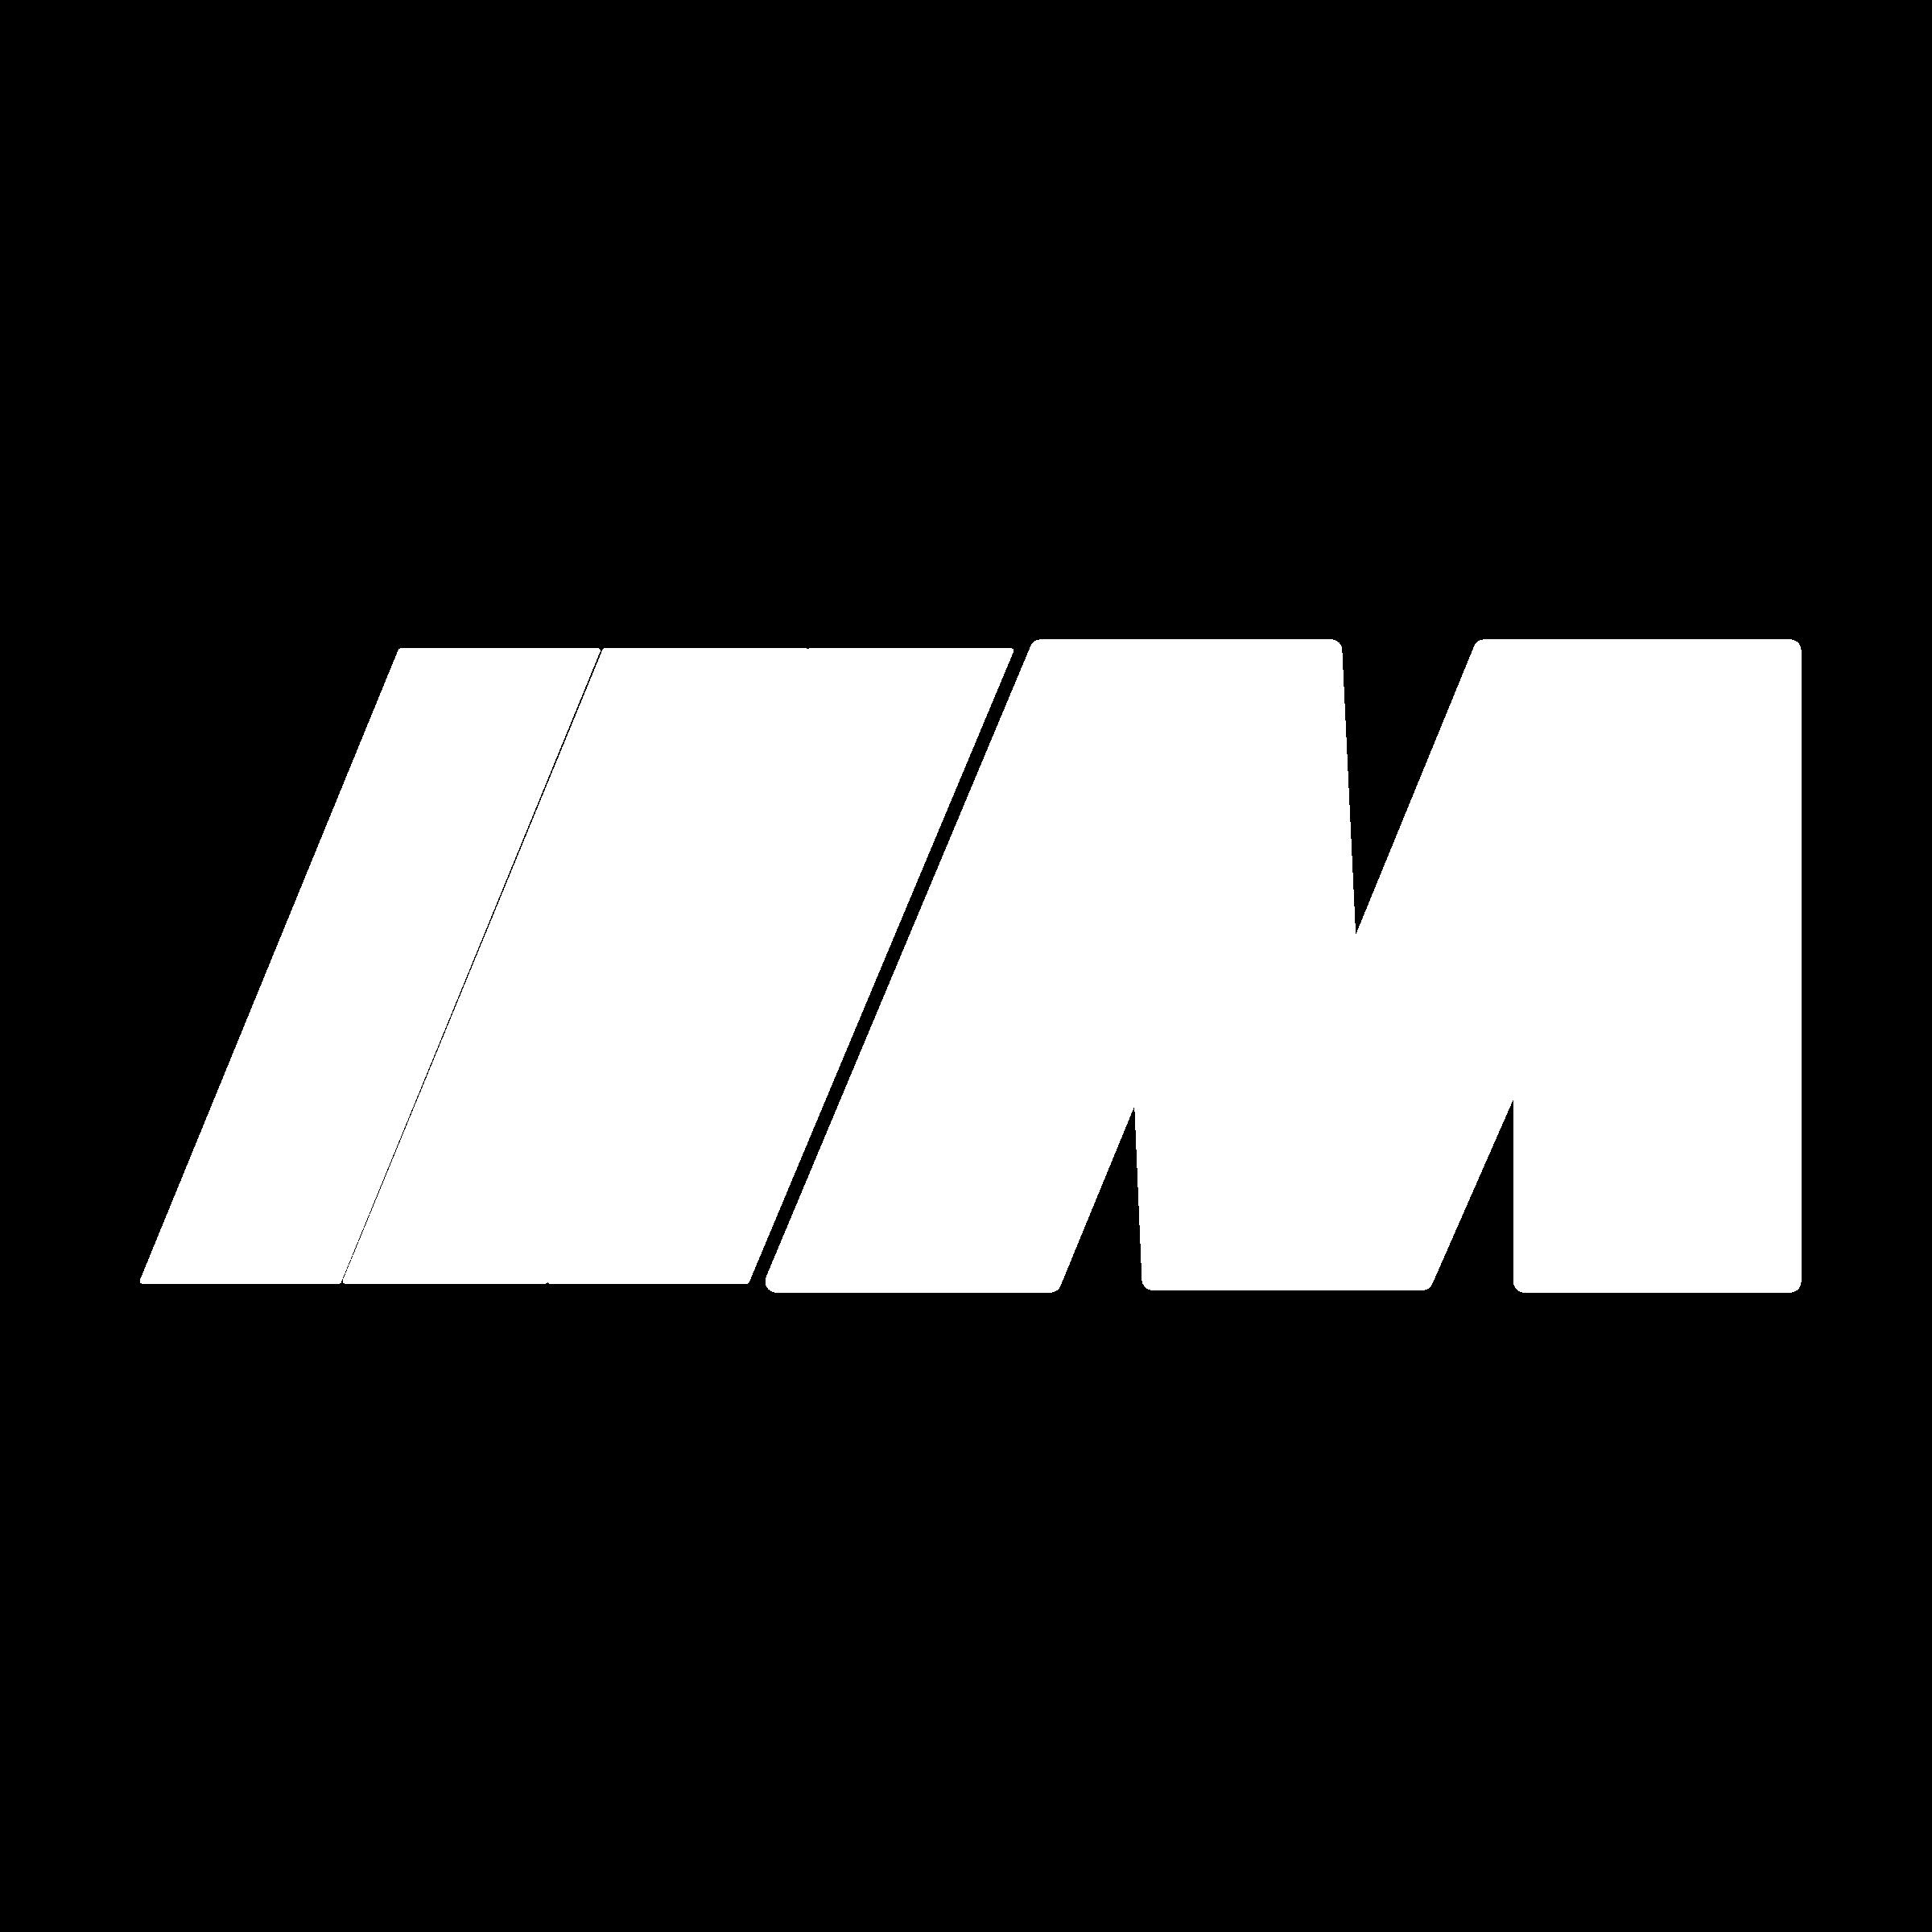 Bmw M Series Logo Png Transparent Svg Vector Freebie Supply